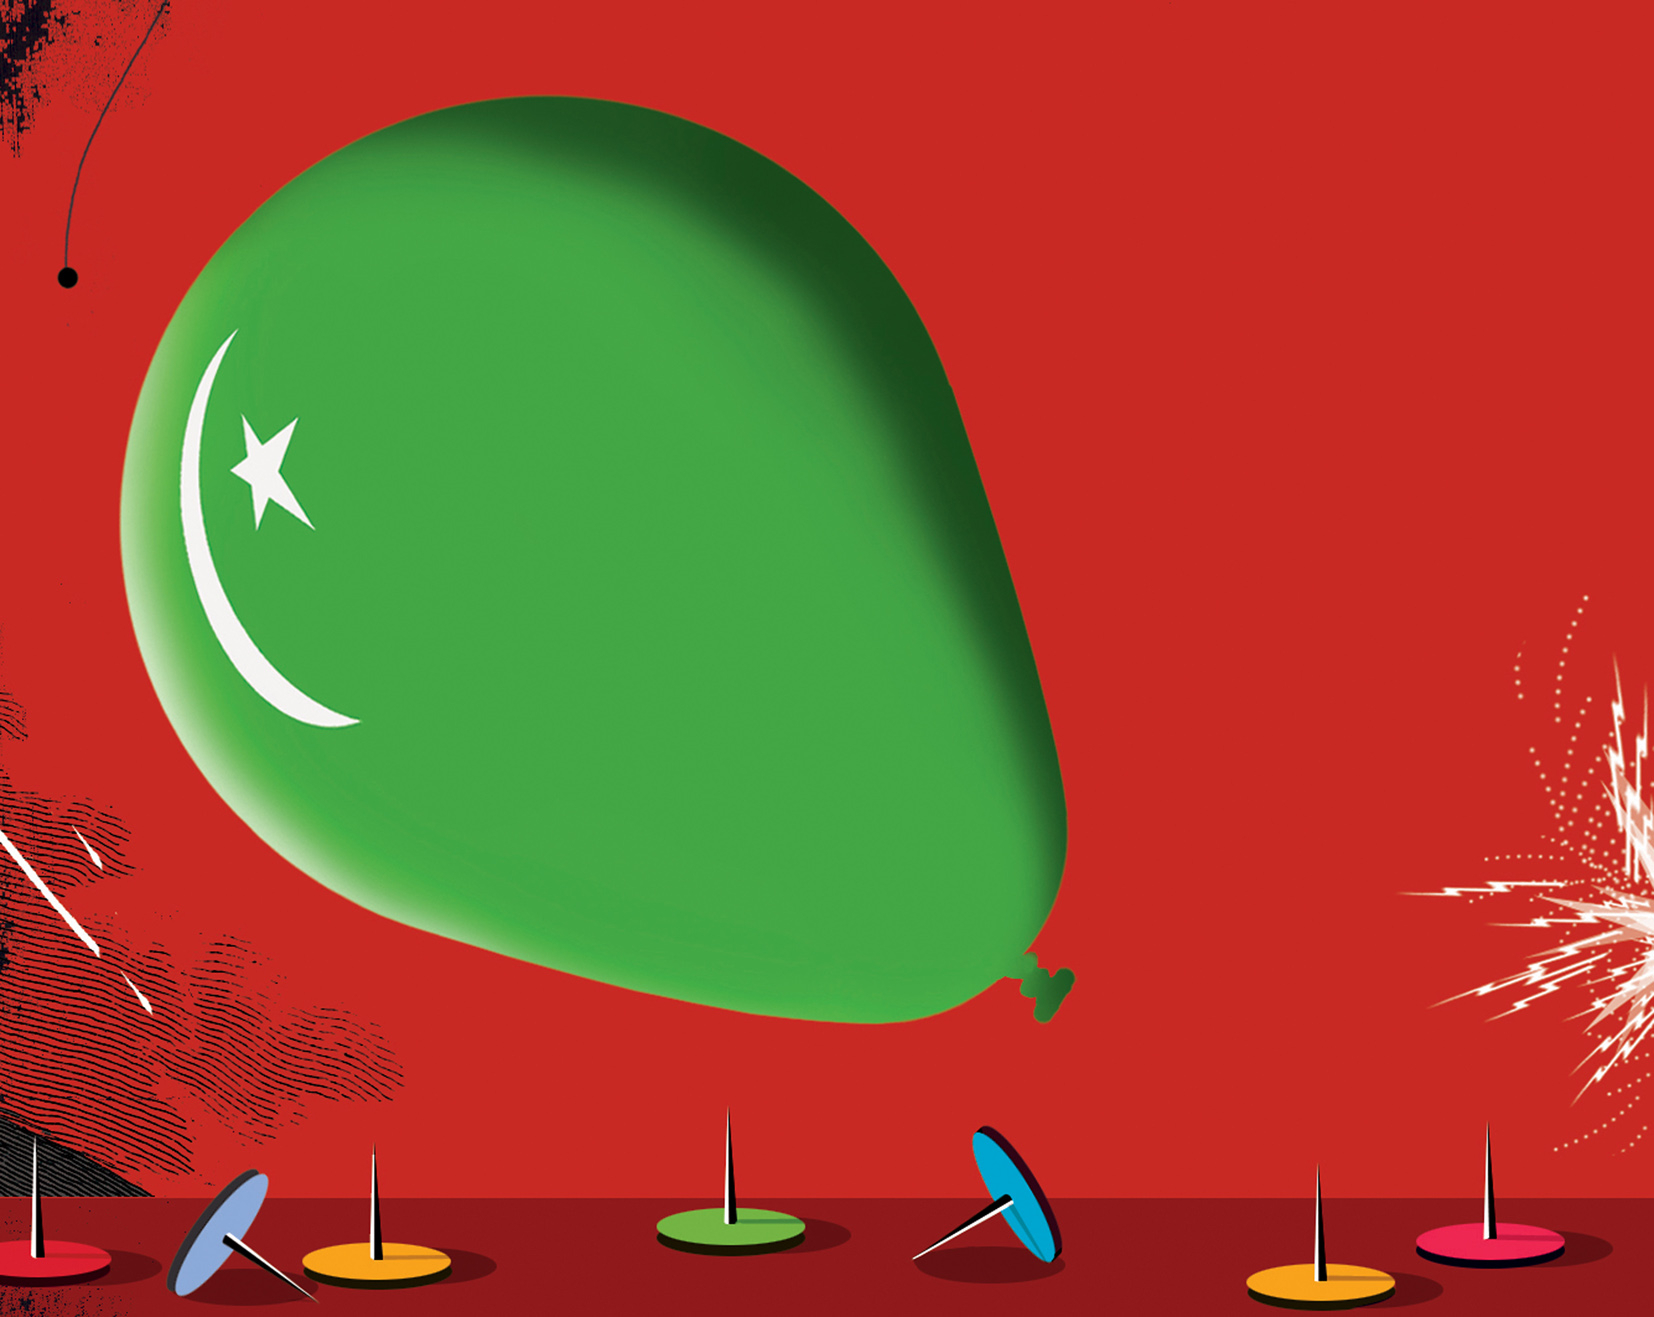 Pakistan Crises The Guardian